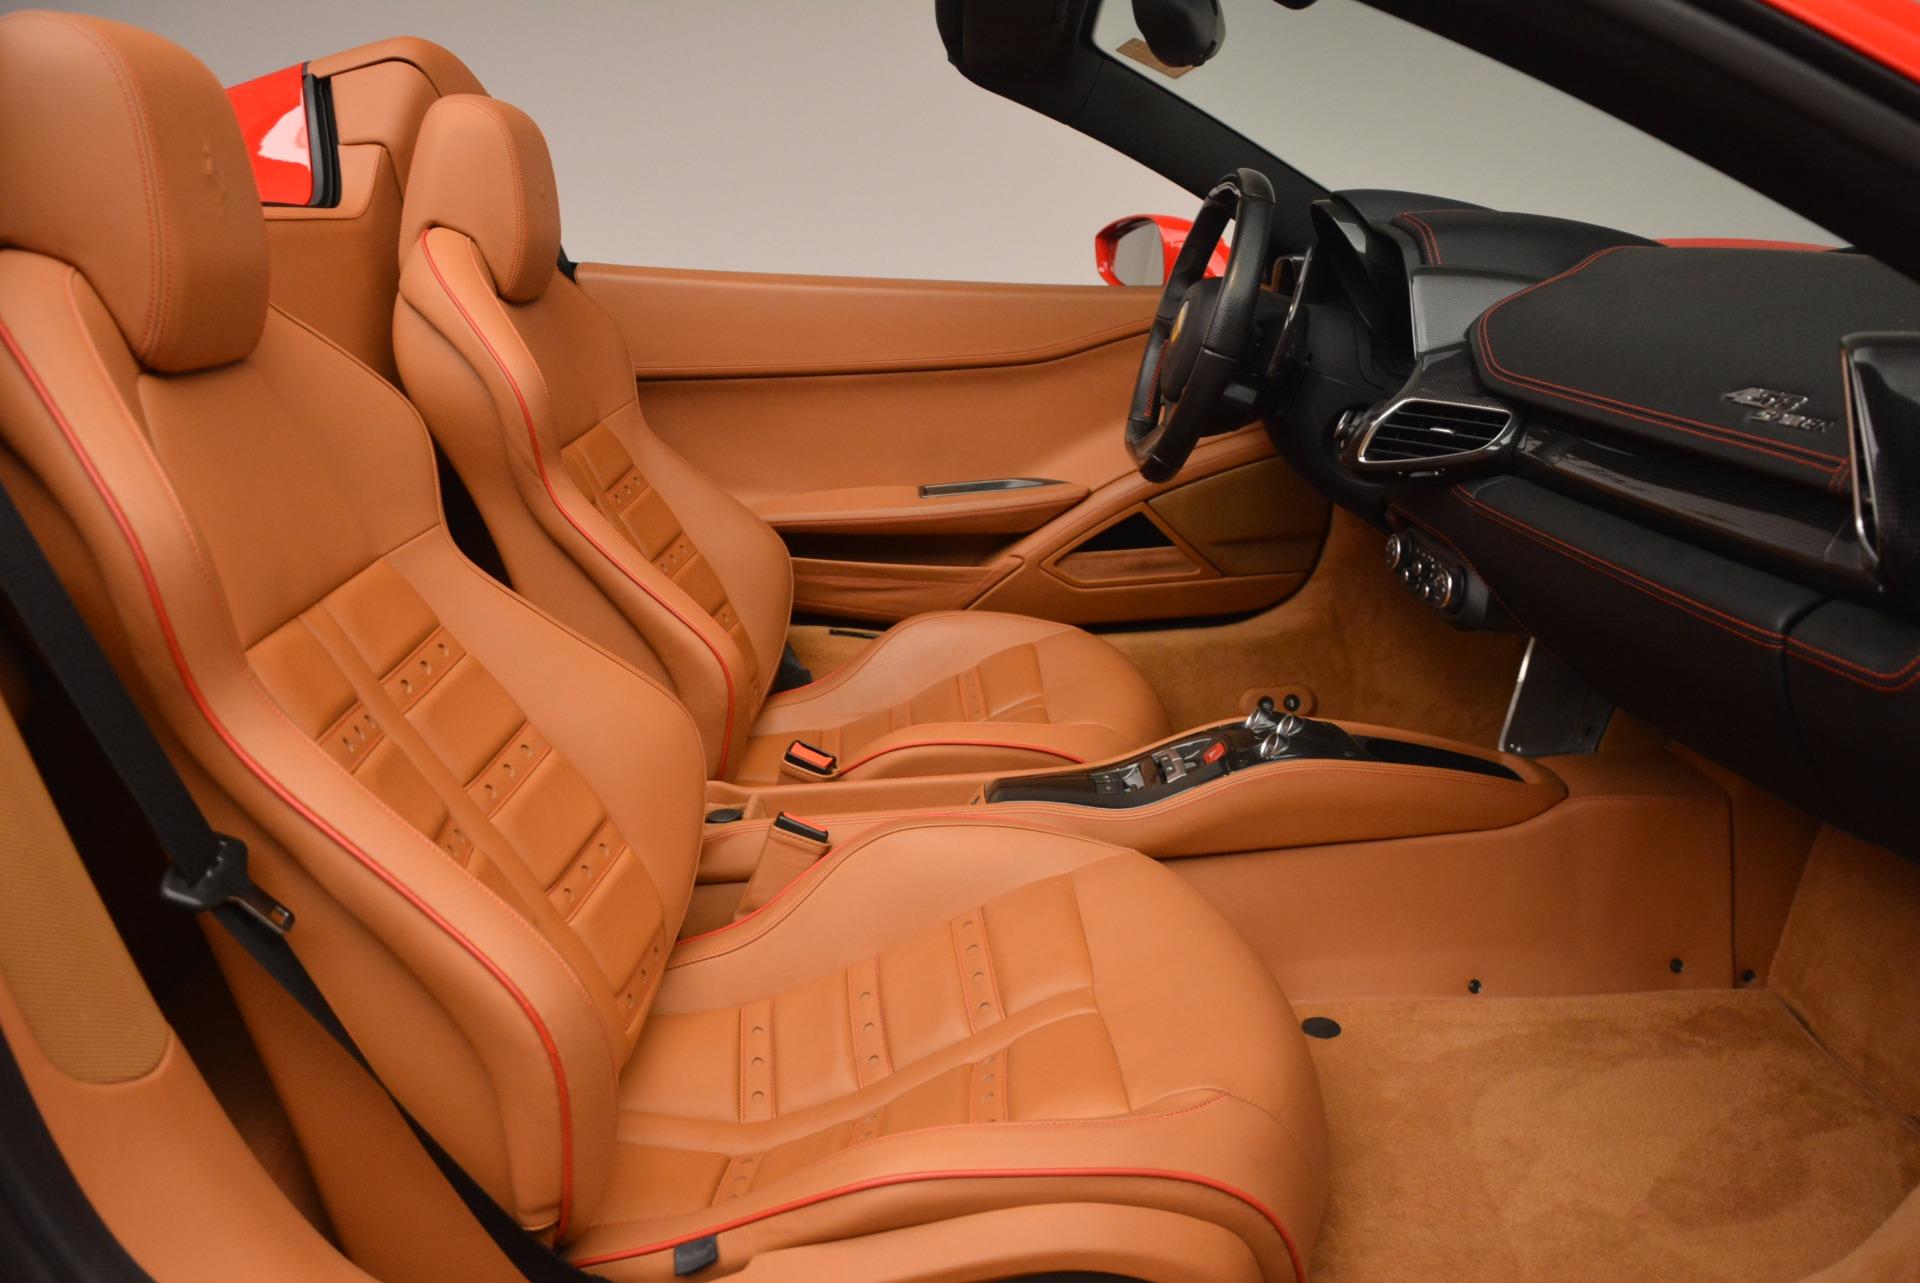 Used 2013 Ferrari 458 Spider  For Sale In Greenwich, CT 1784_p30